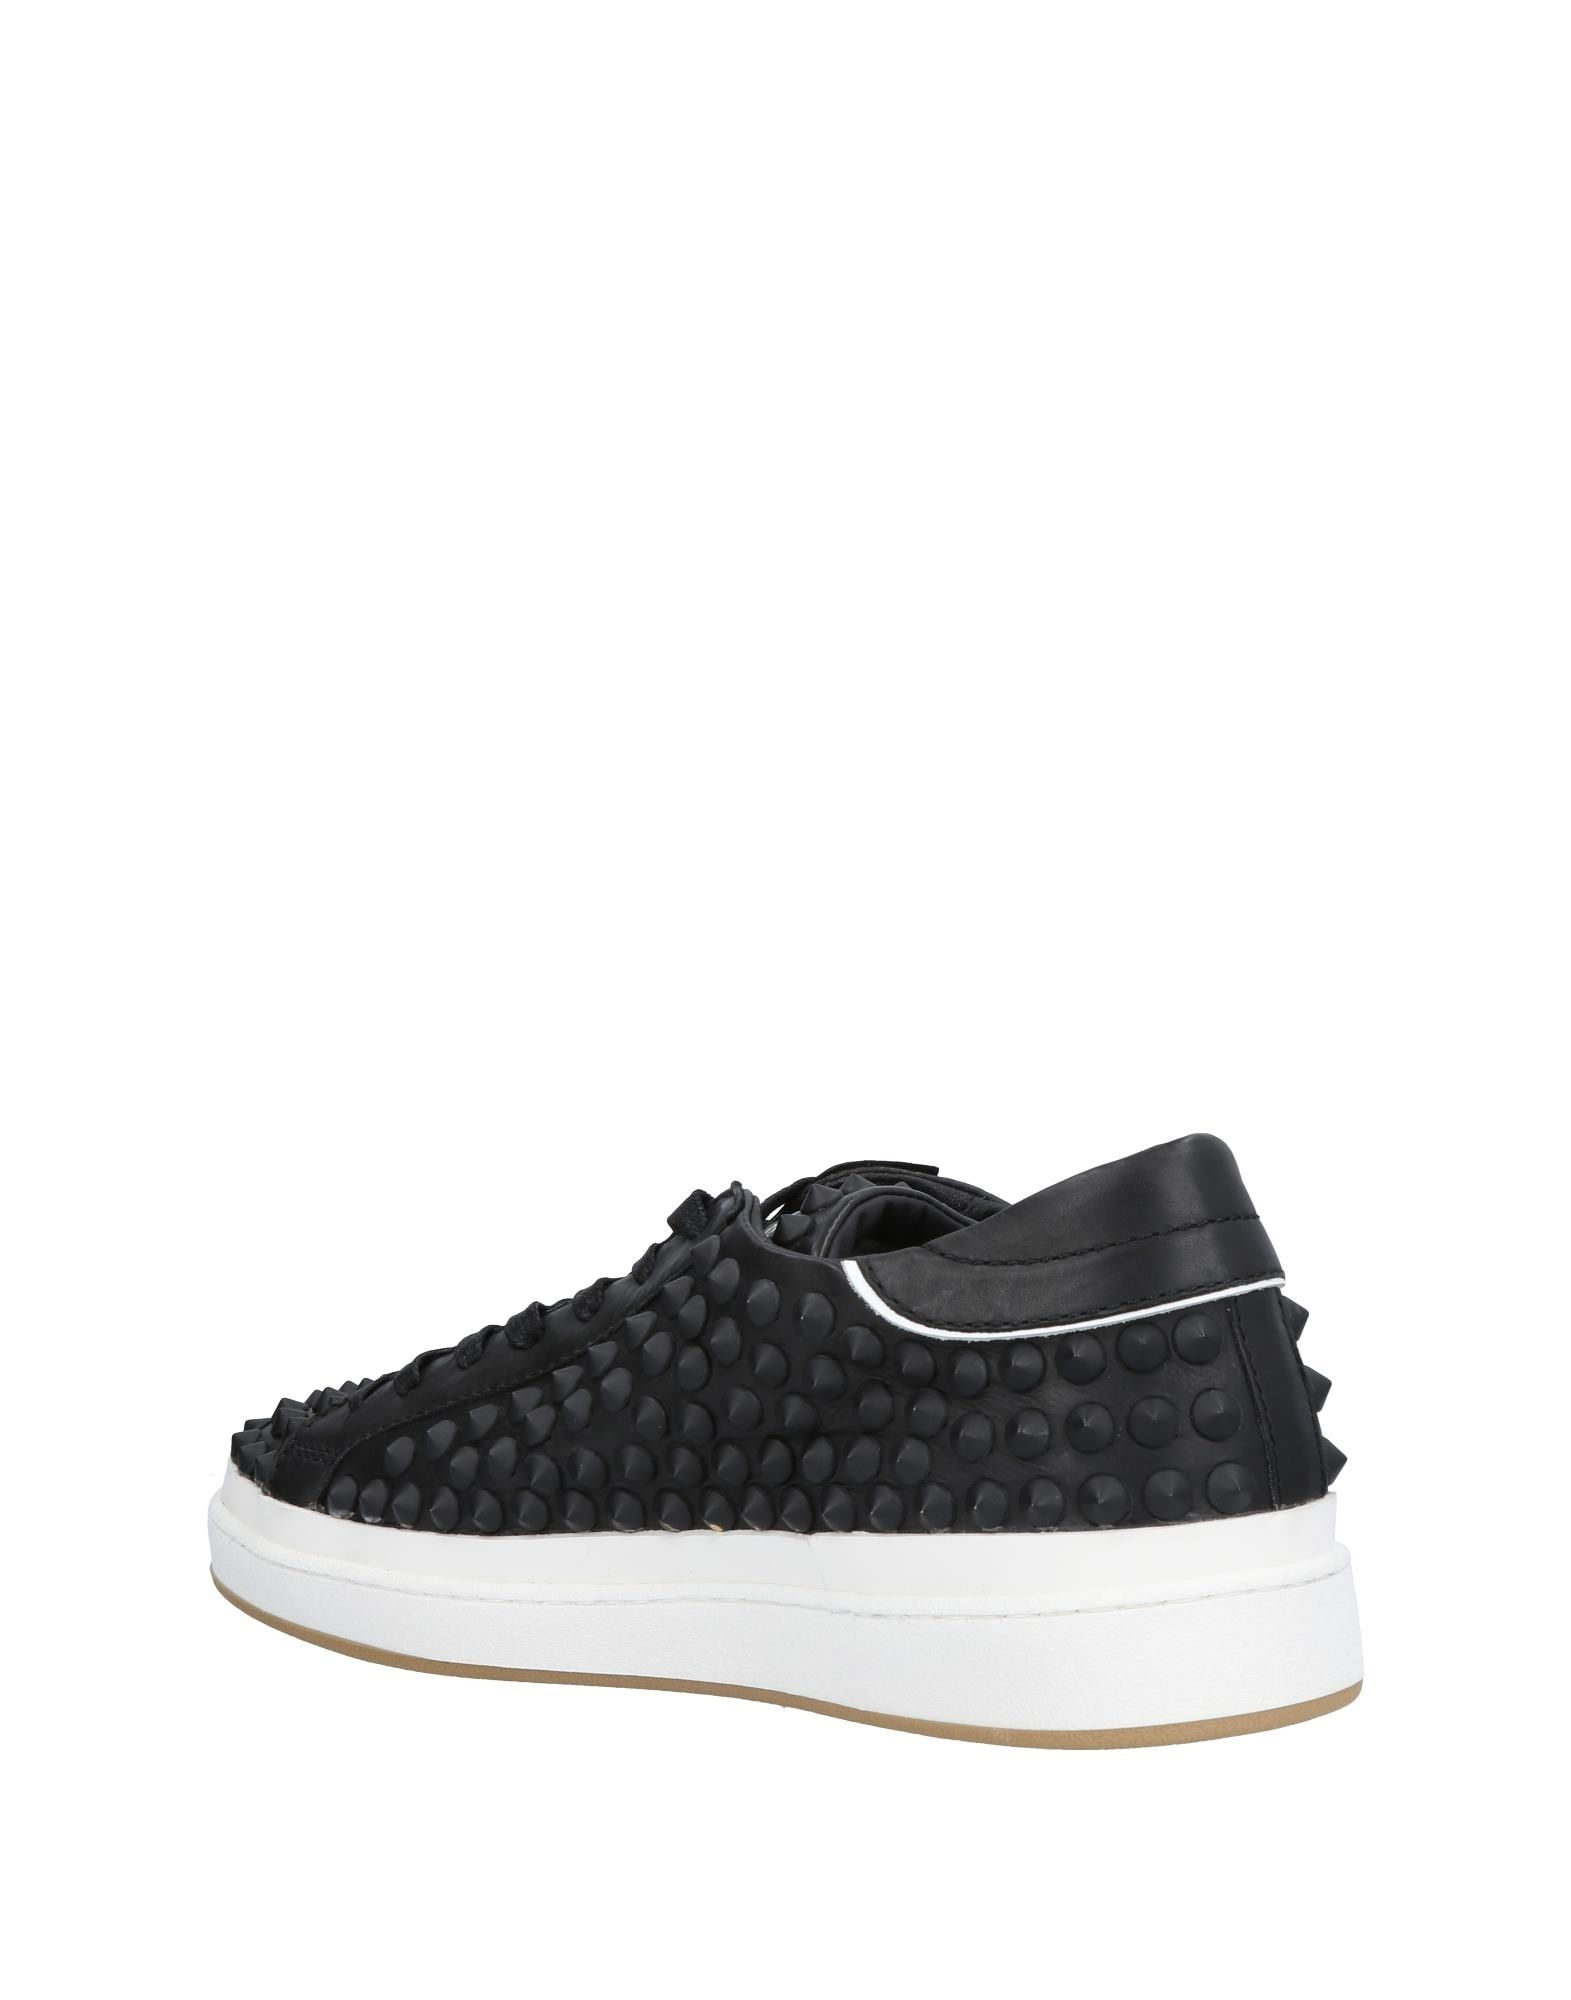 Philippe Model Sneakers Herren  11432886QQ Gute Qualität beliebte Schuhe